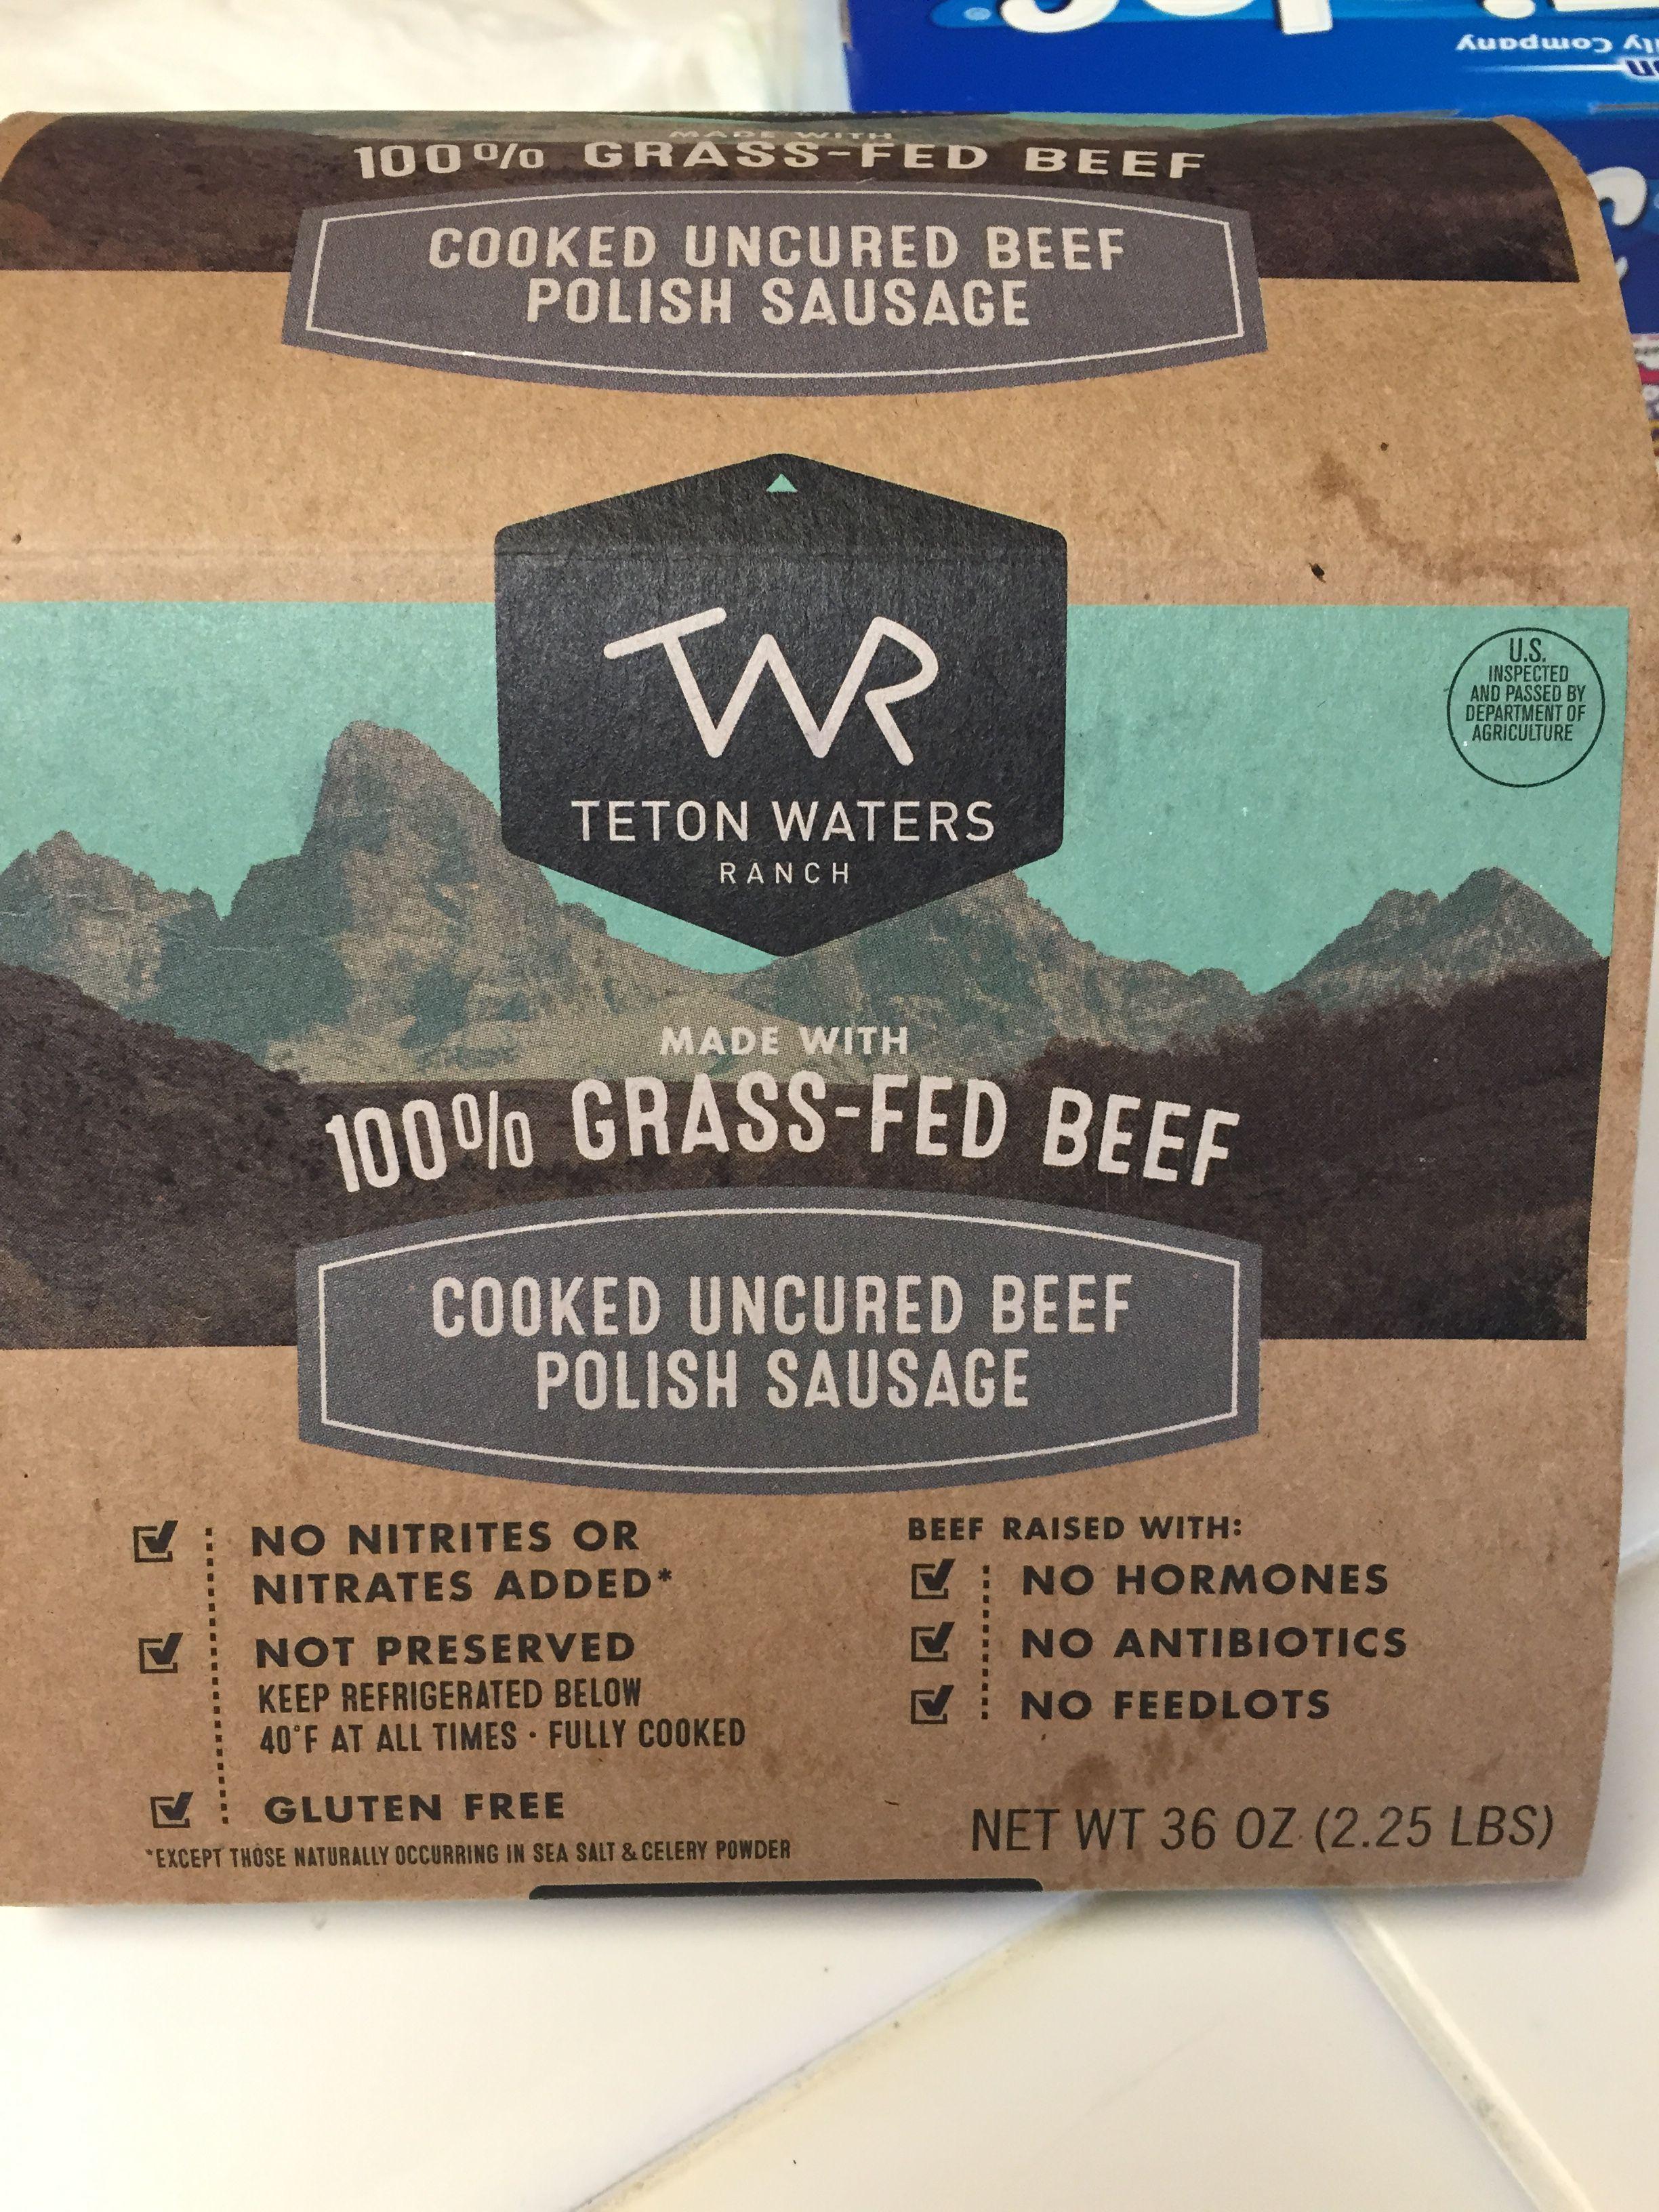 Costco Grass Fed Beef Plant Paradox Grassfed